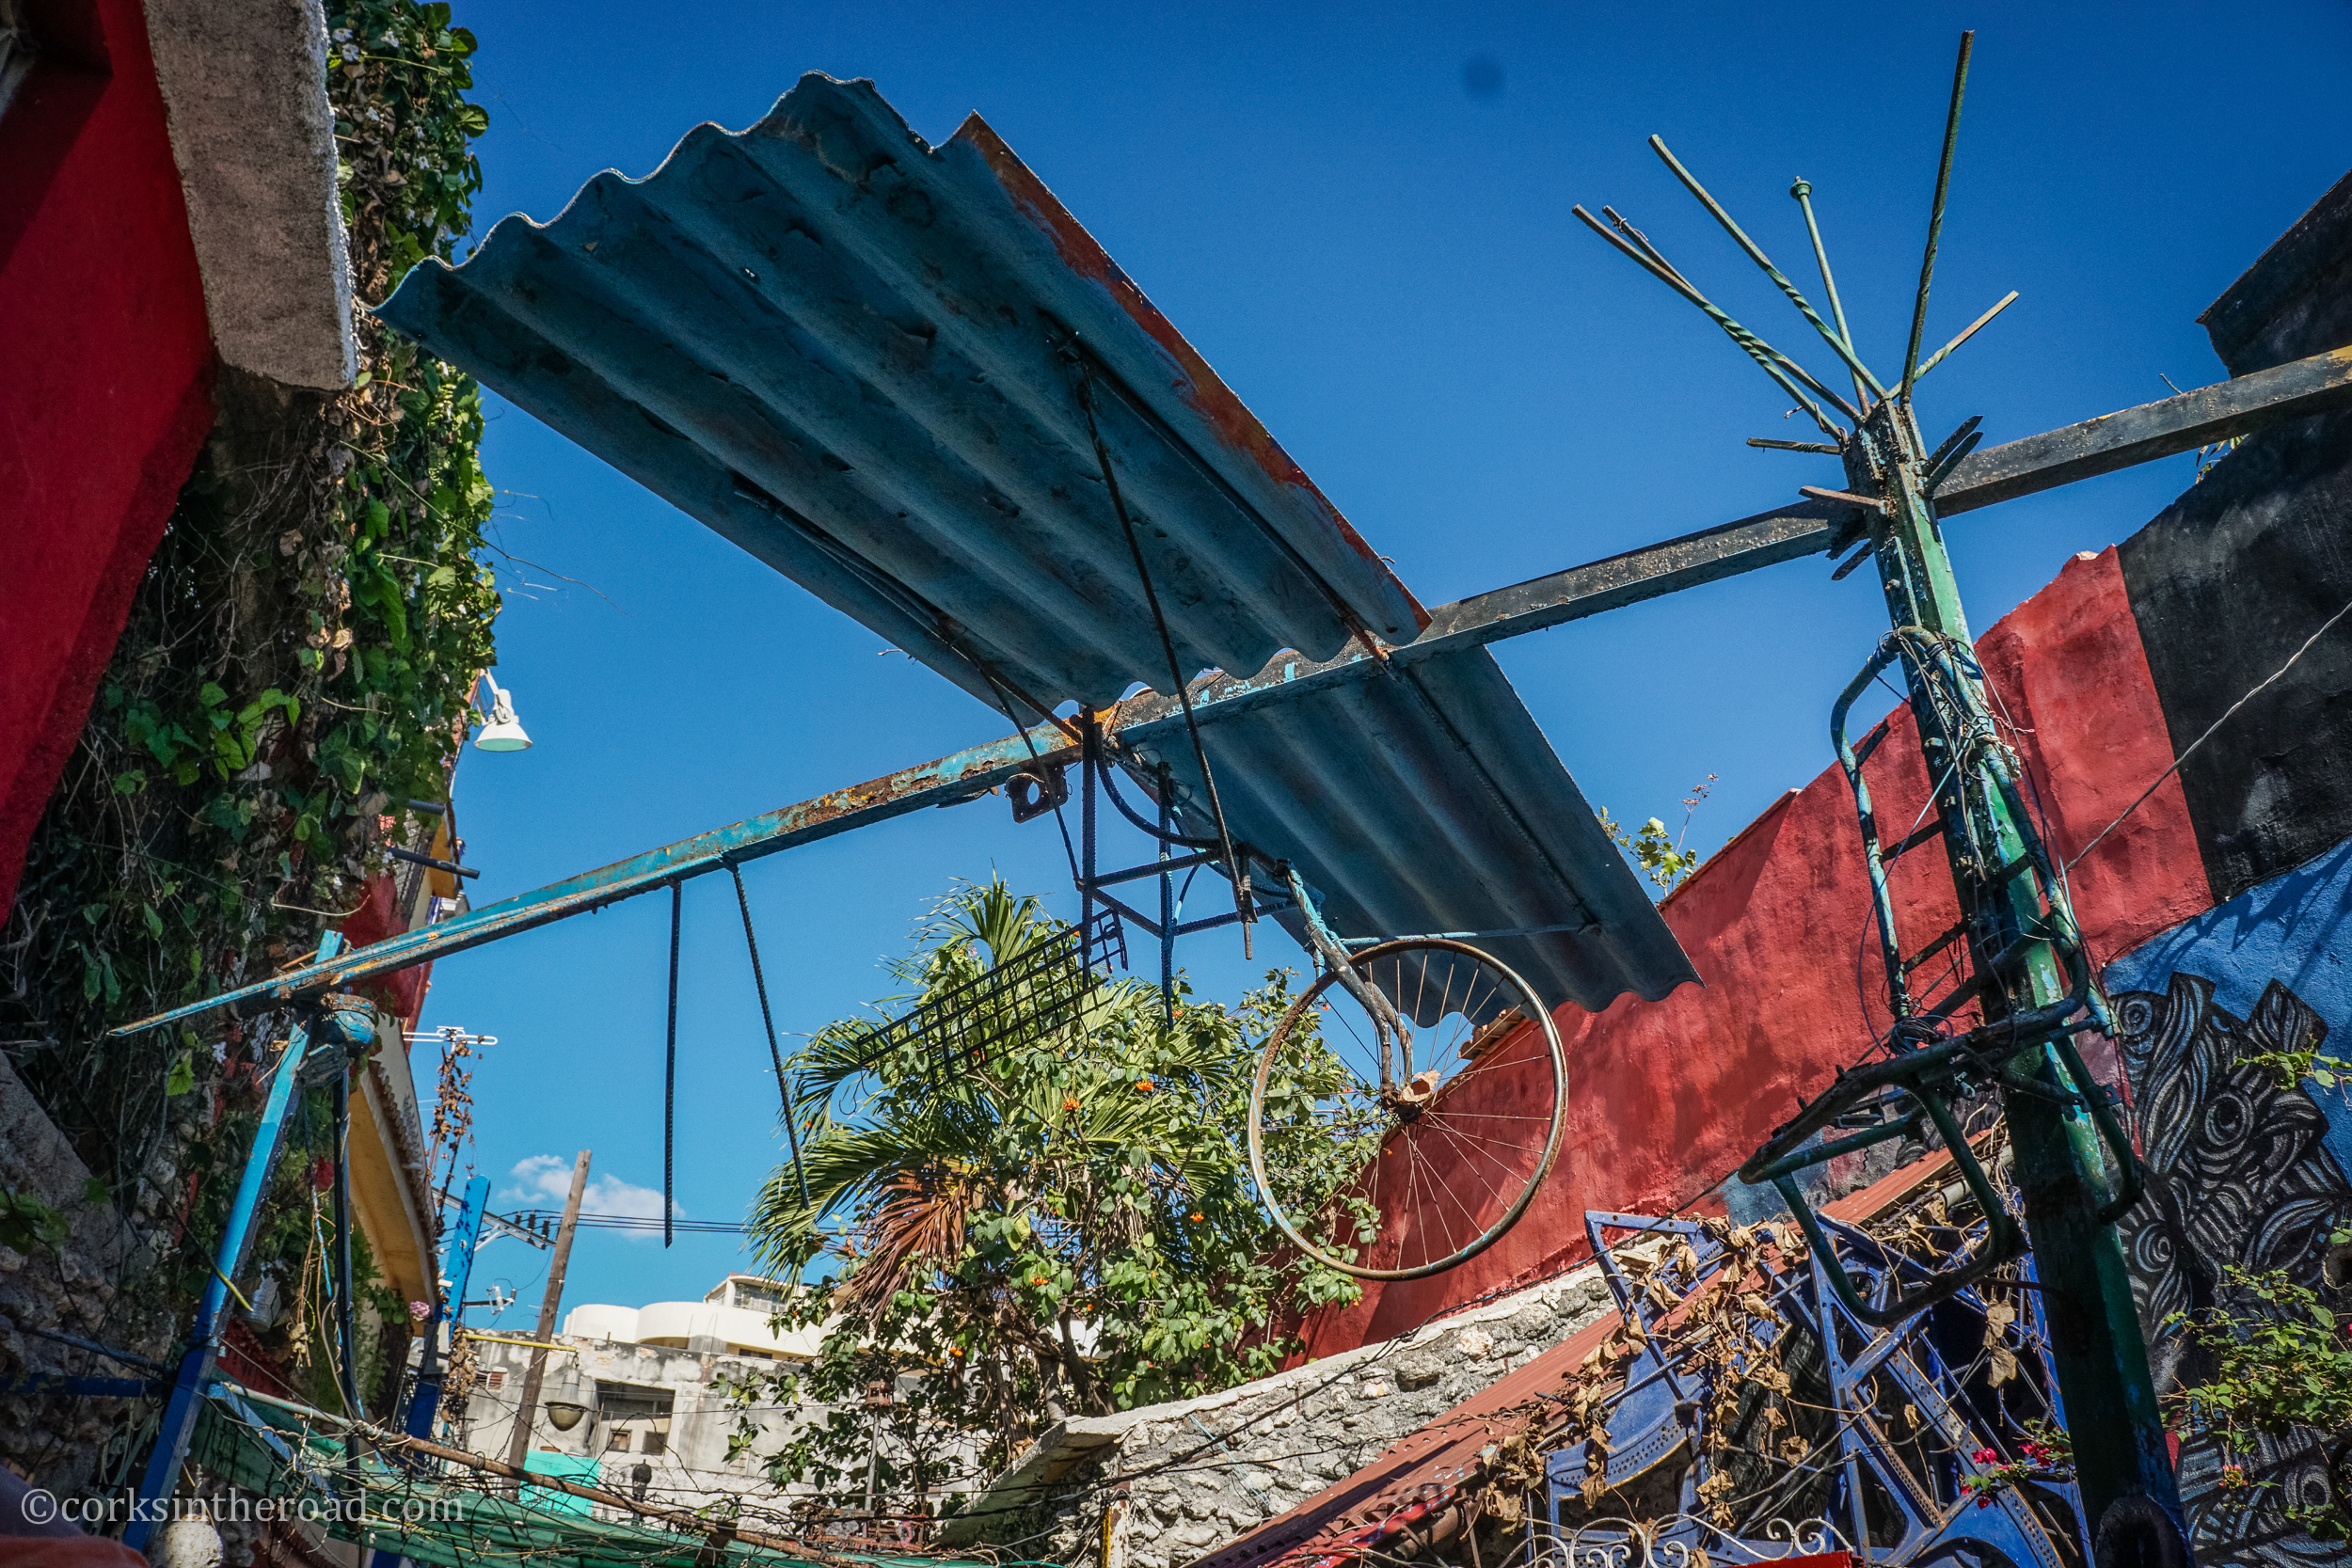 Corksintheroad, Cuba, Hamel, Street Art.jpg